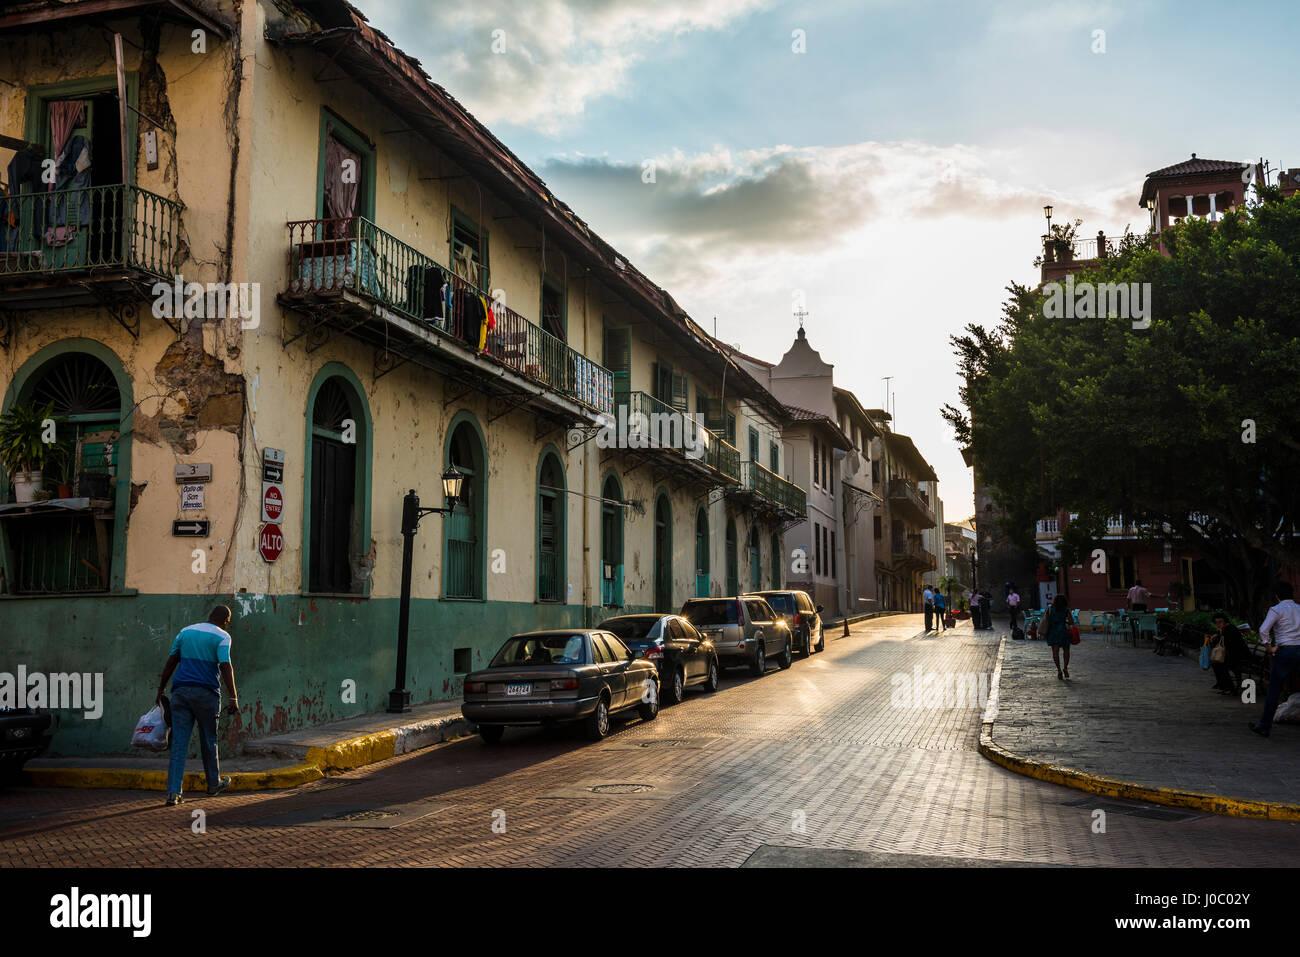 Straßenszene, Casco Viejo, UNESCO-Weltkulturerbe, Panama City, Panama, Mittelamerika Stockbild